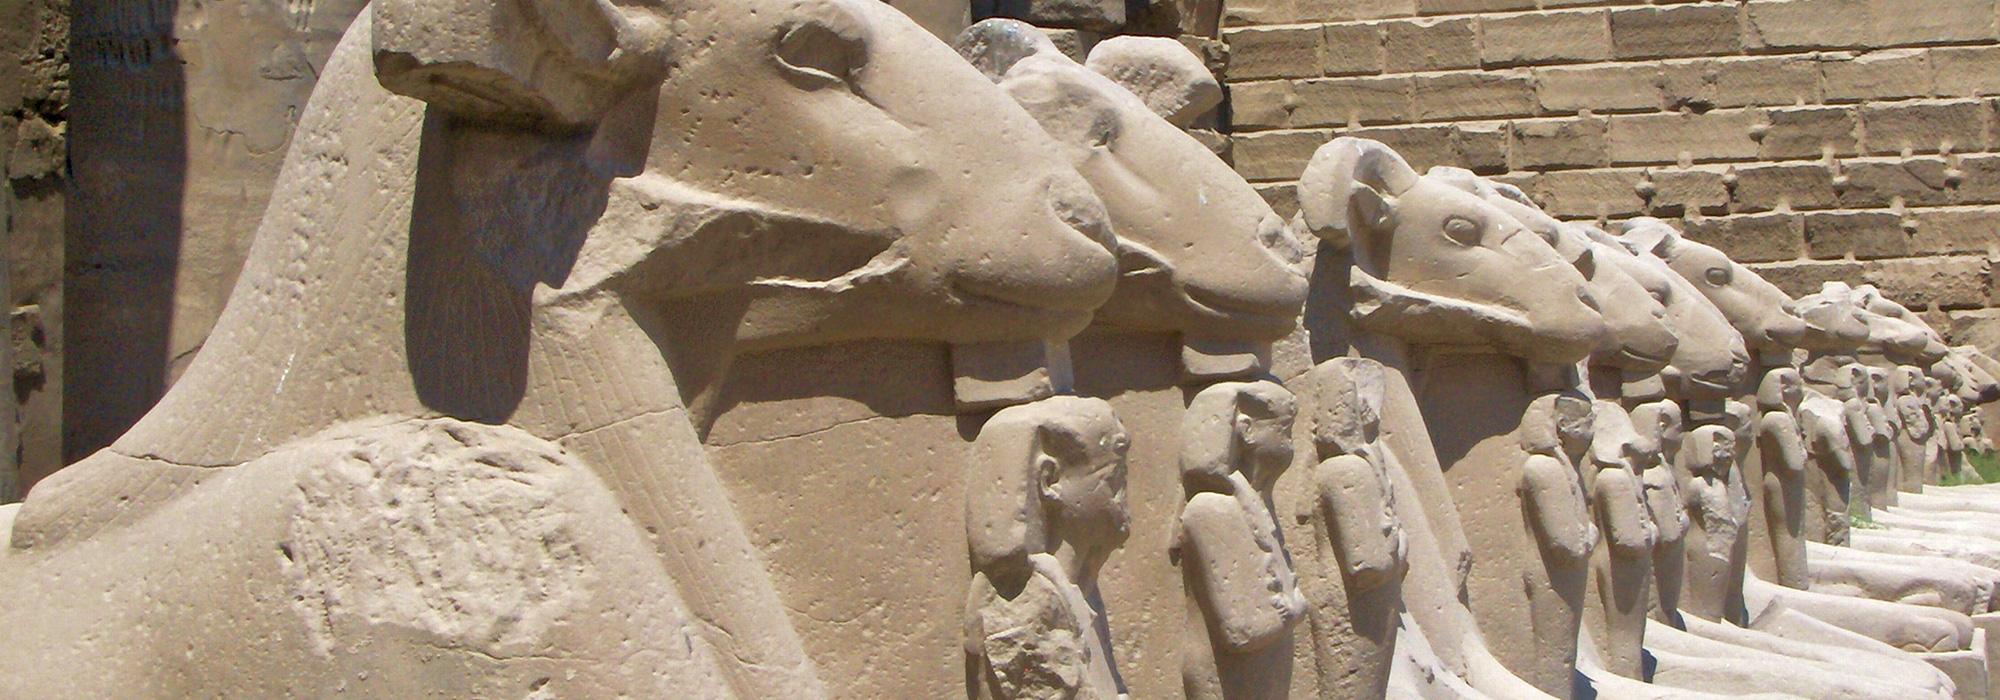 Goat Sphinxes at Karnak Temple